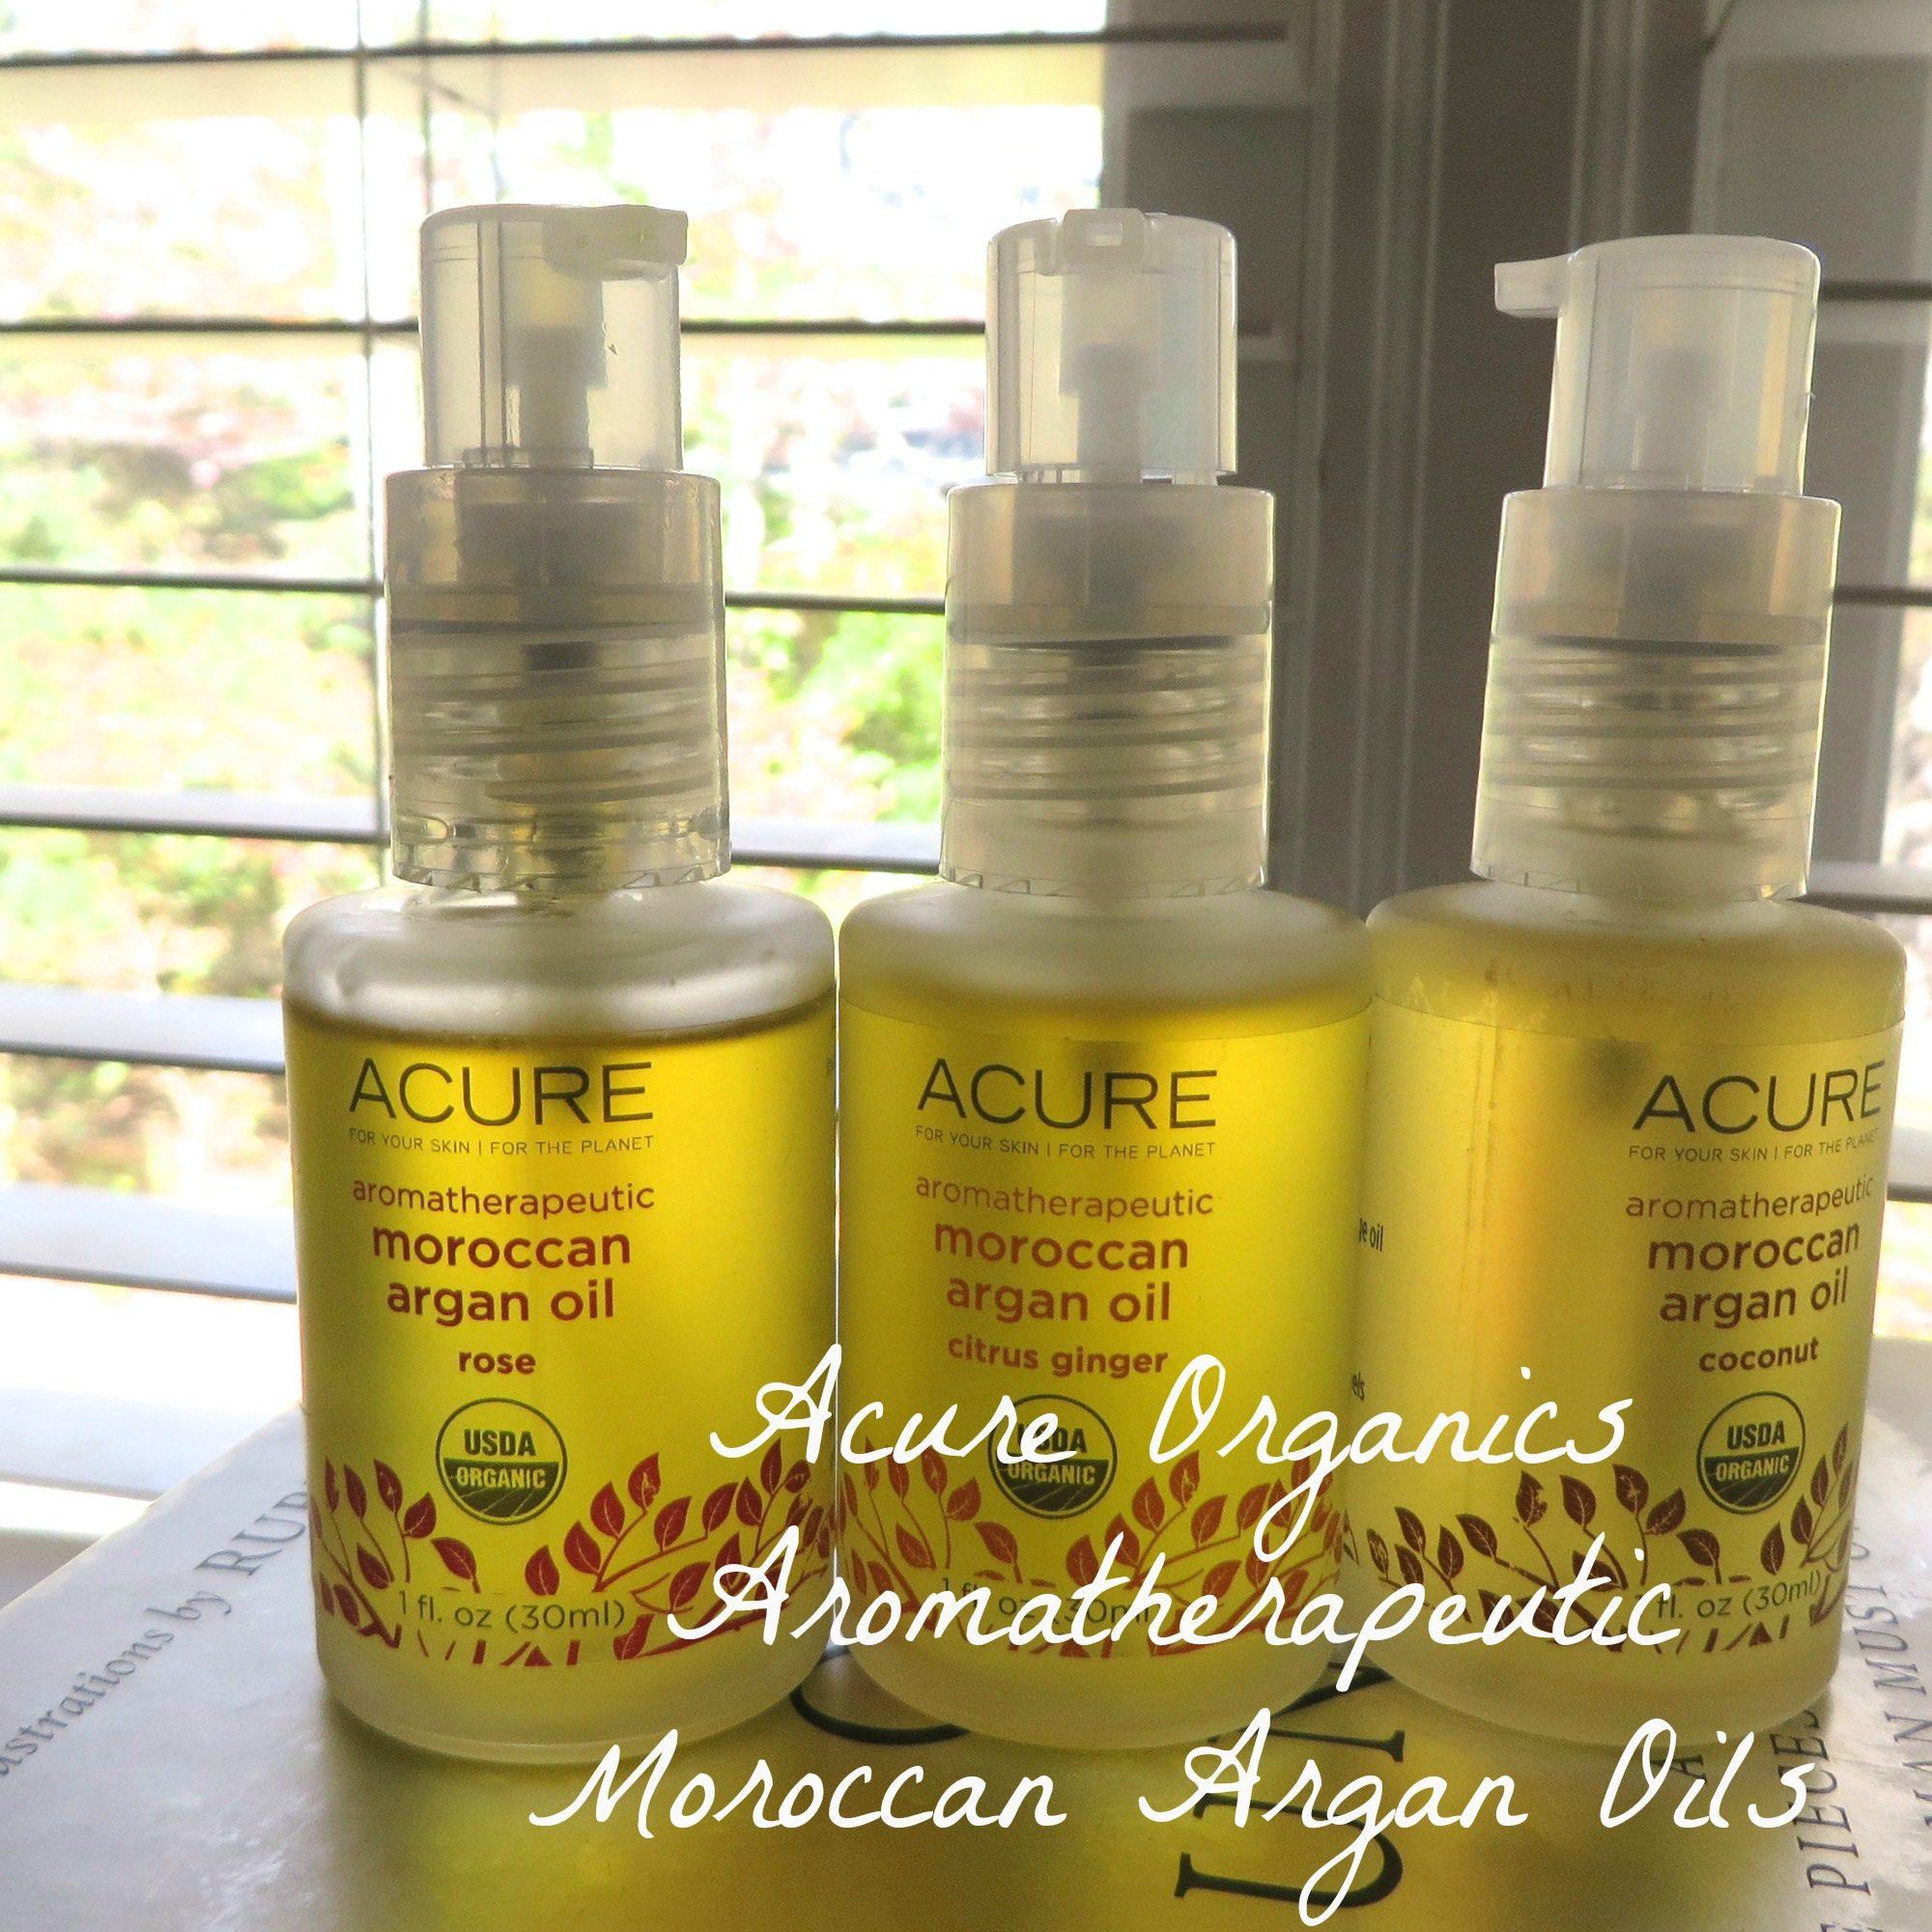 Acure Organics Aromatherapeutic Moroccan Argan Oils